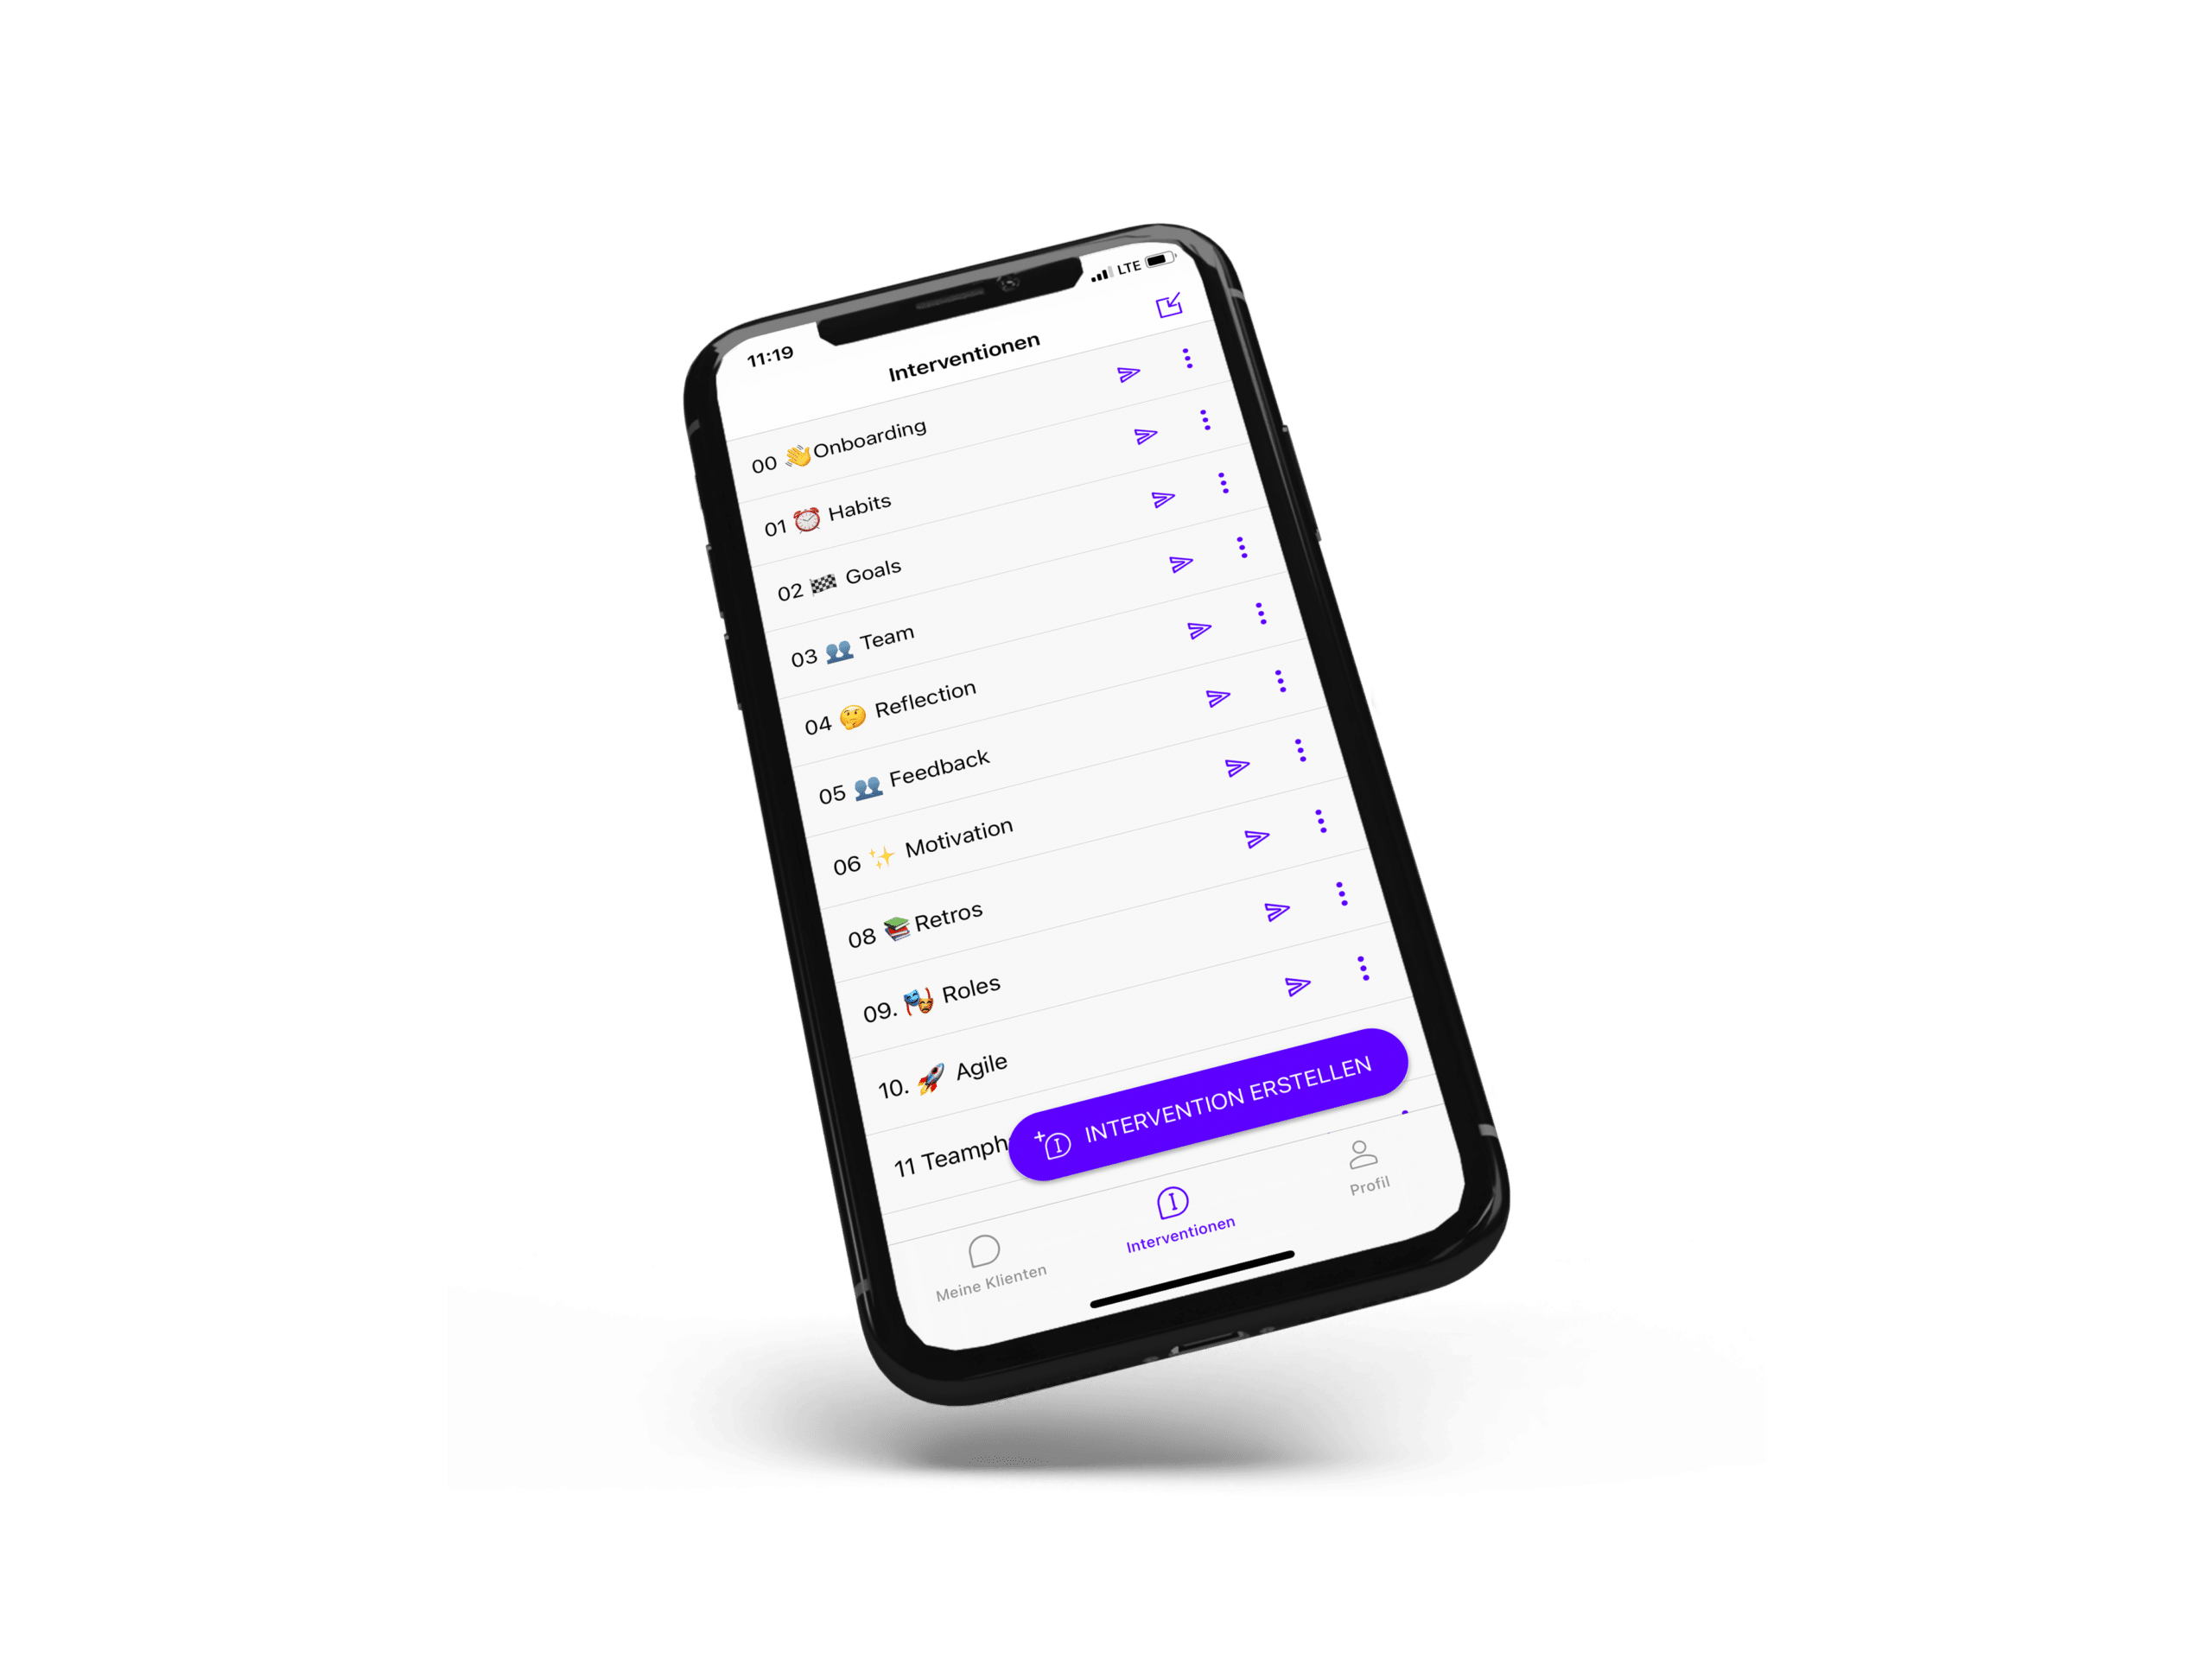 Einfach digitales Coaching per App anbieten